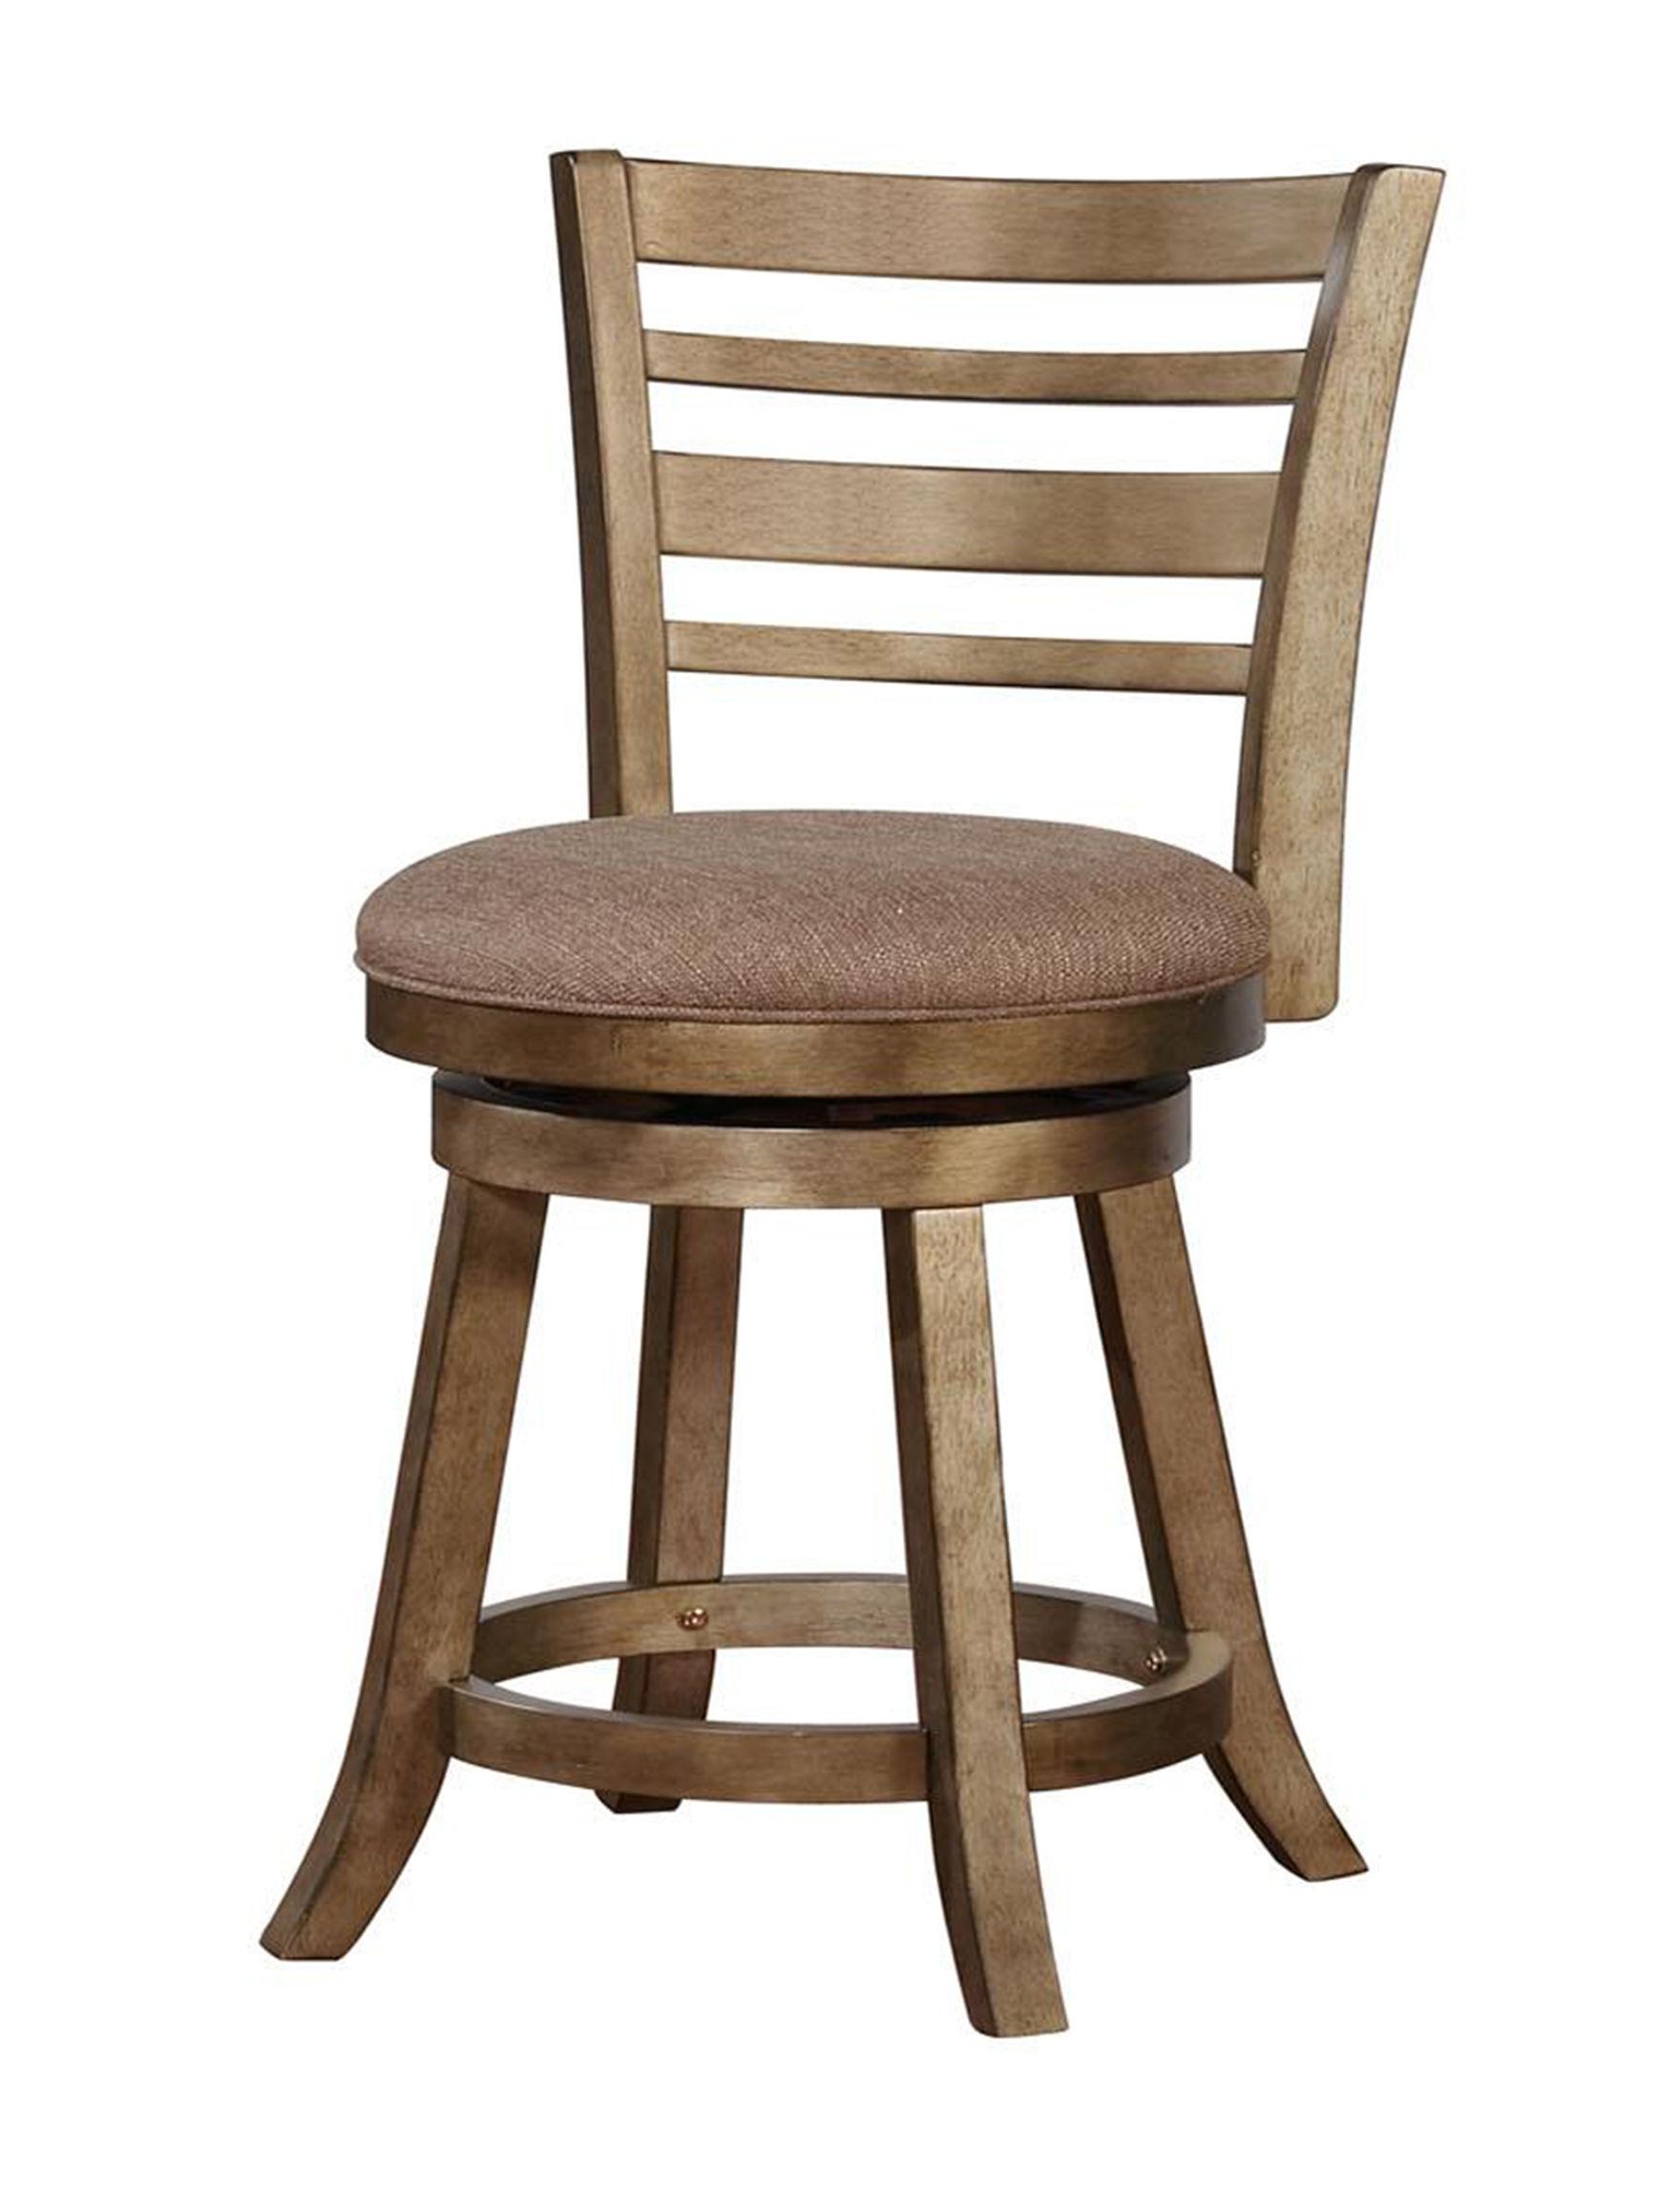 Linon Brown Bar & Kitchen Stools Kitchen & Dining Furniture